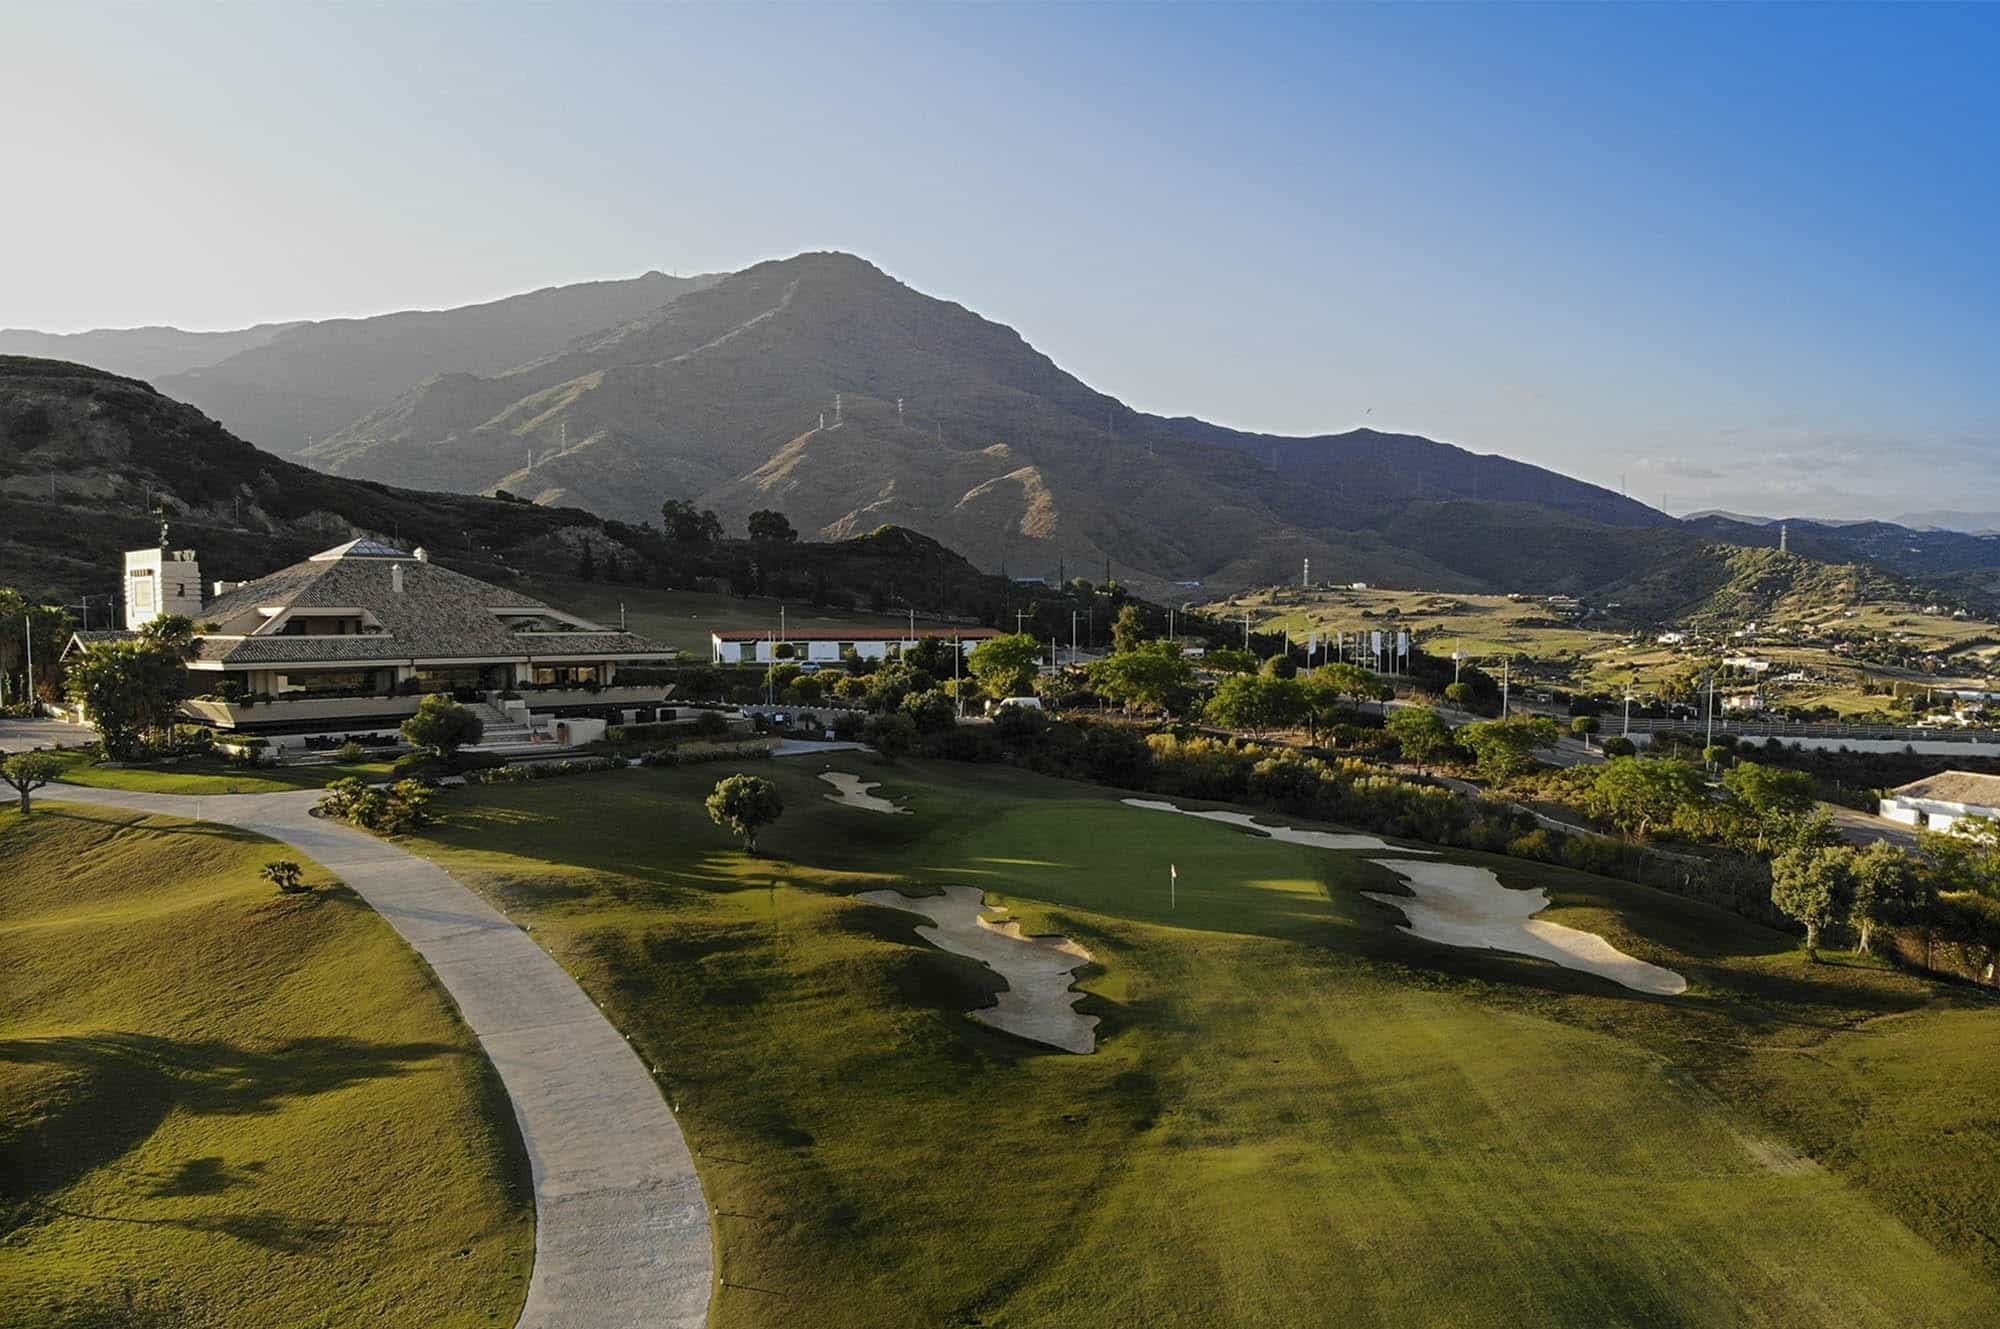 Valle Romano Golf & Resort – Golf Costa Del Sol regarding 16 10 2015 In Romano